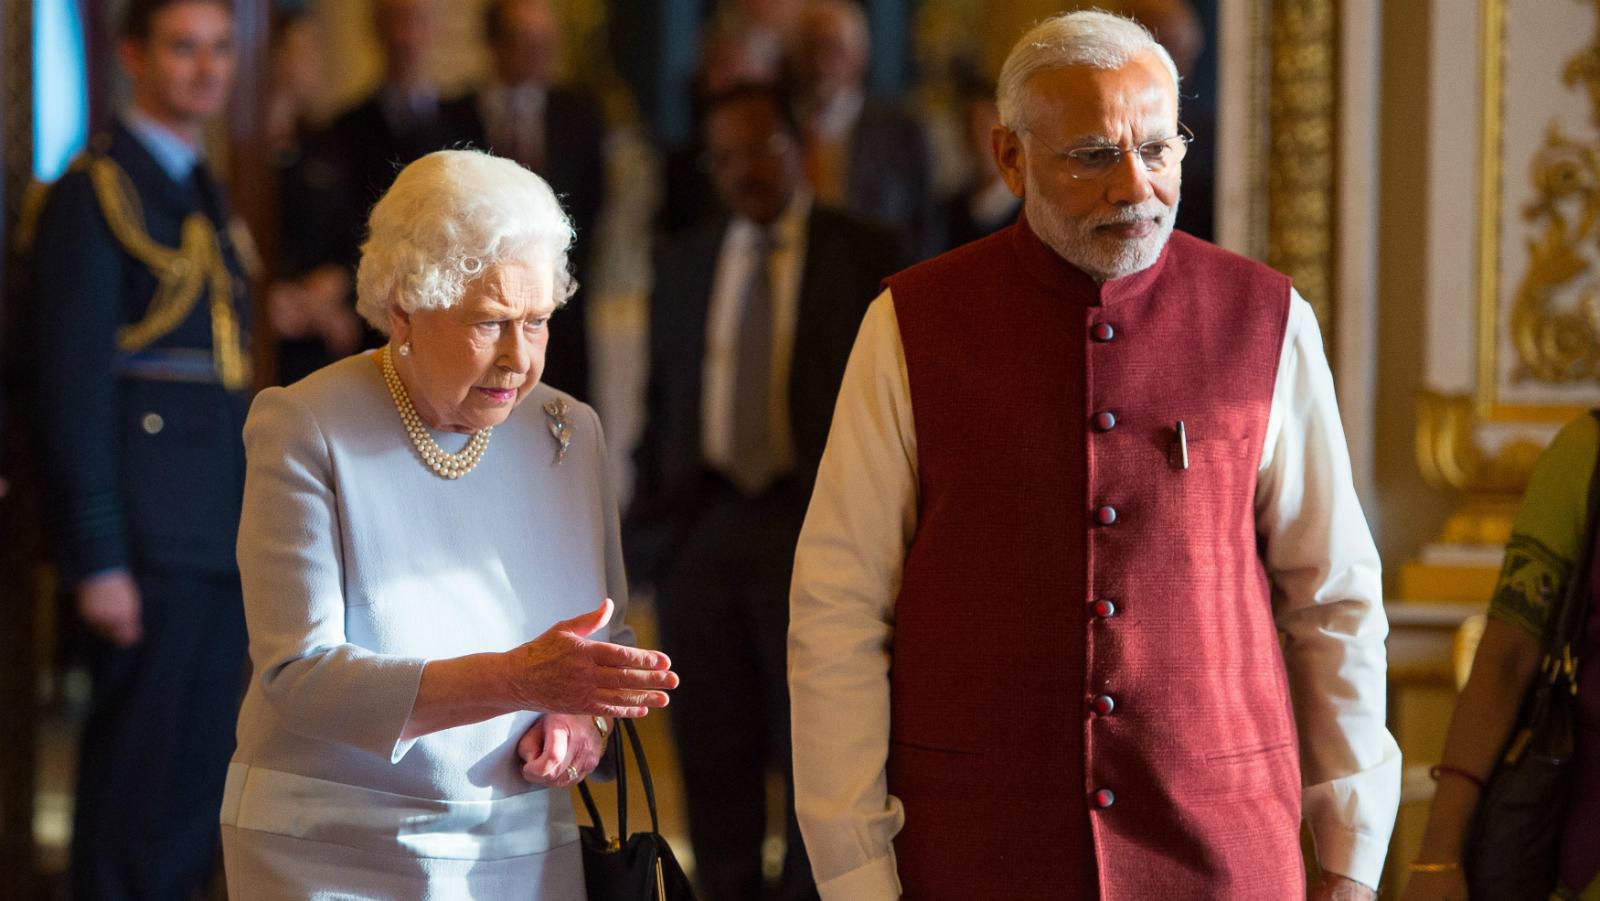 Britain's Queen Elizabeth meets Indian Prime Minister Narendra Modi at Buckingham Palace, London, November 13, 2015.